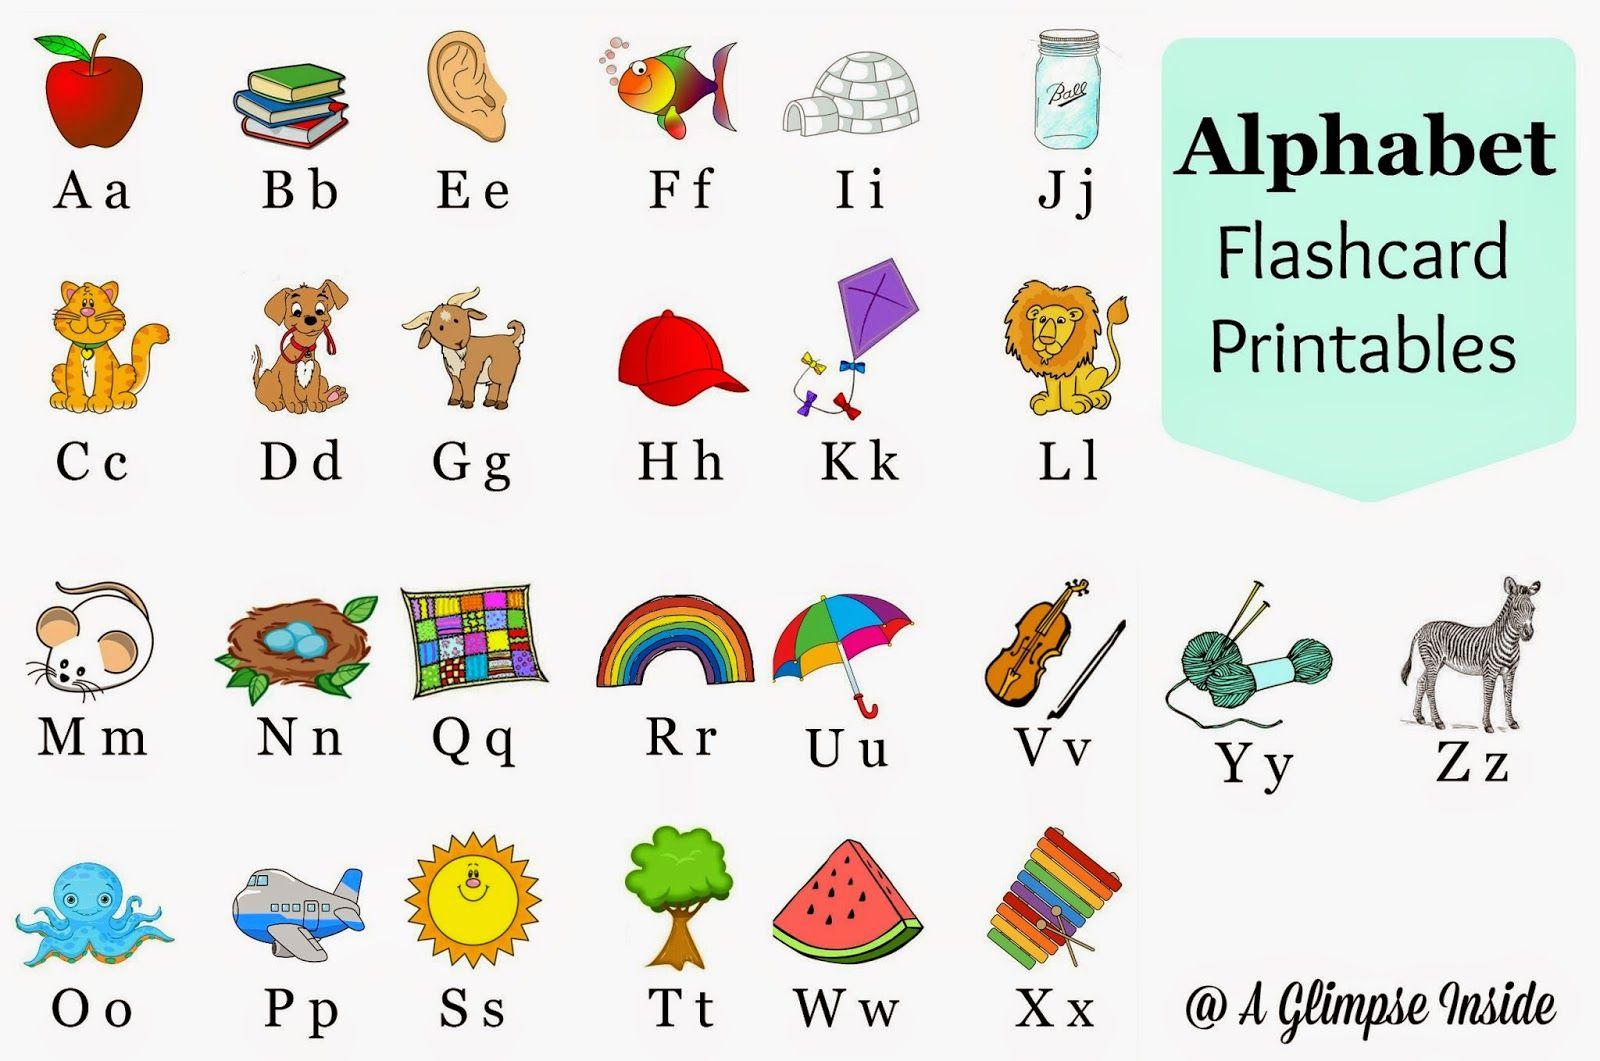 A Glimpse Inside Alphabet Flashcards Printables Printable Flash Cards Alphabet Flashcards Abc Flashcards